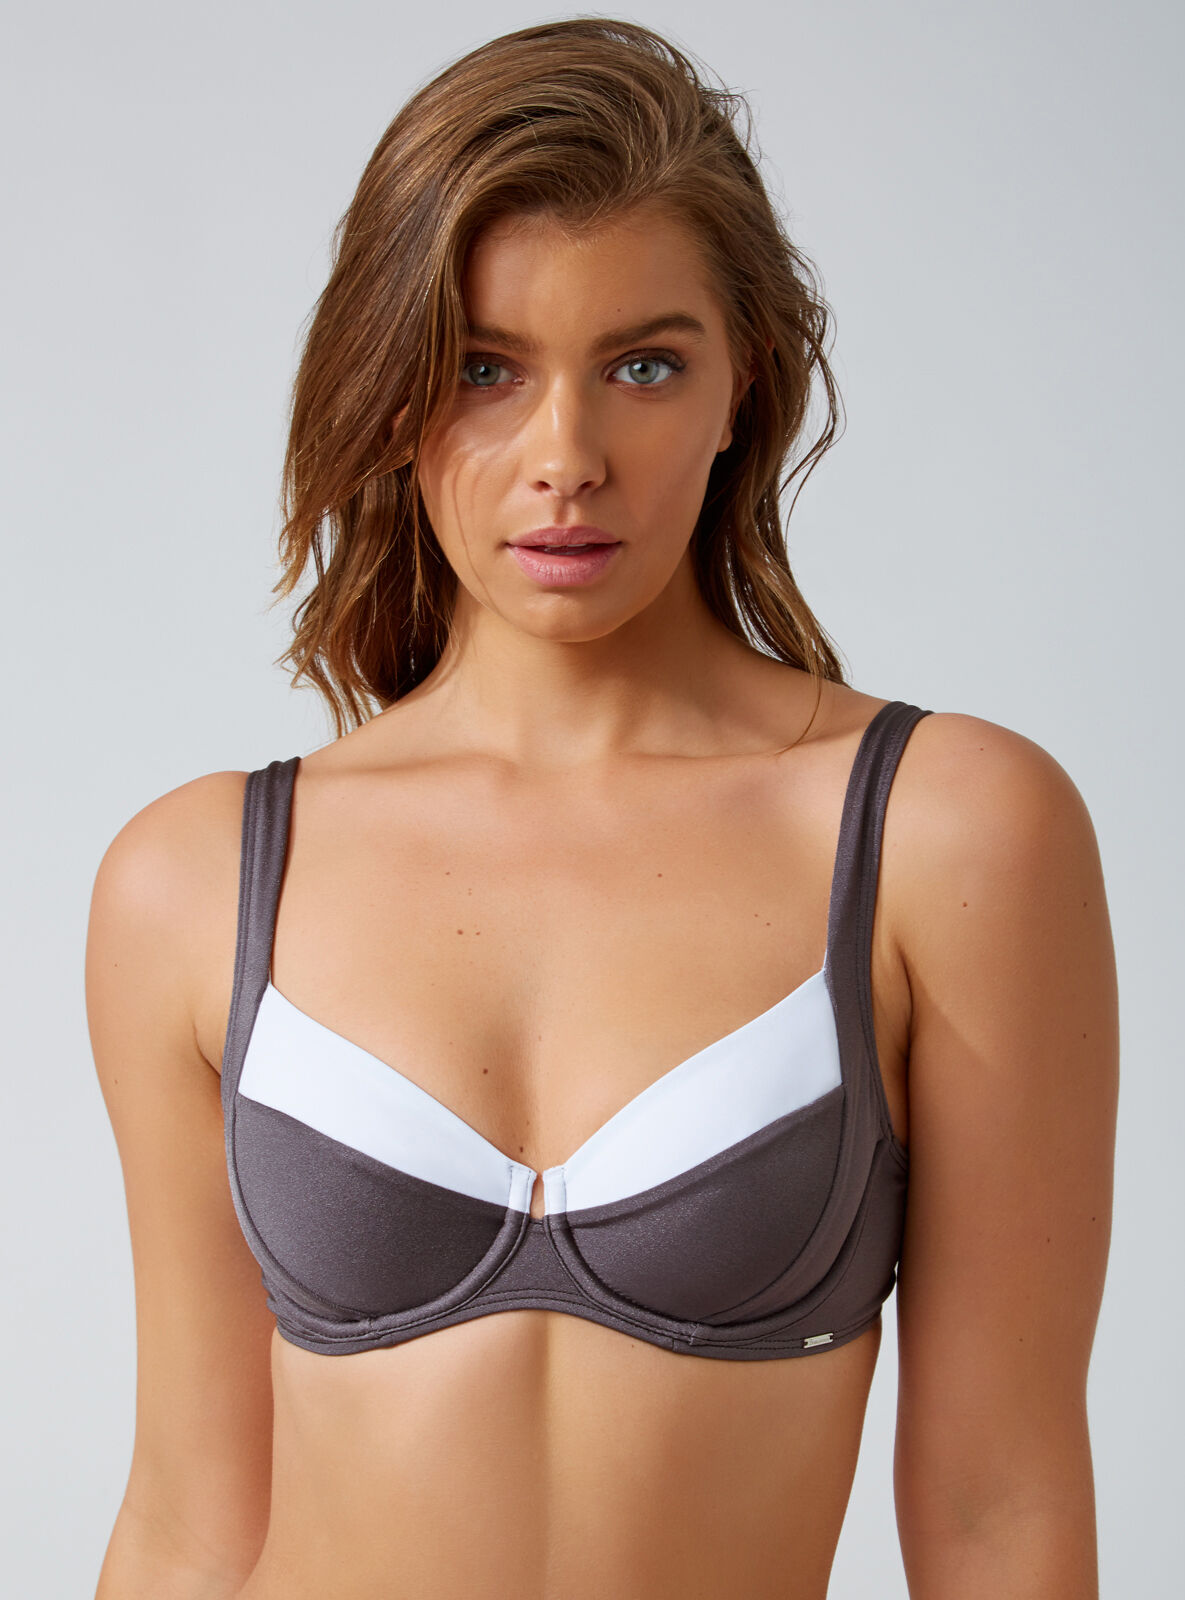 Fuller J4lr35a And For Bikinis Ddswimwear Busts f6Y7byIgv